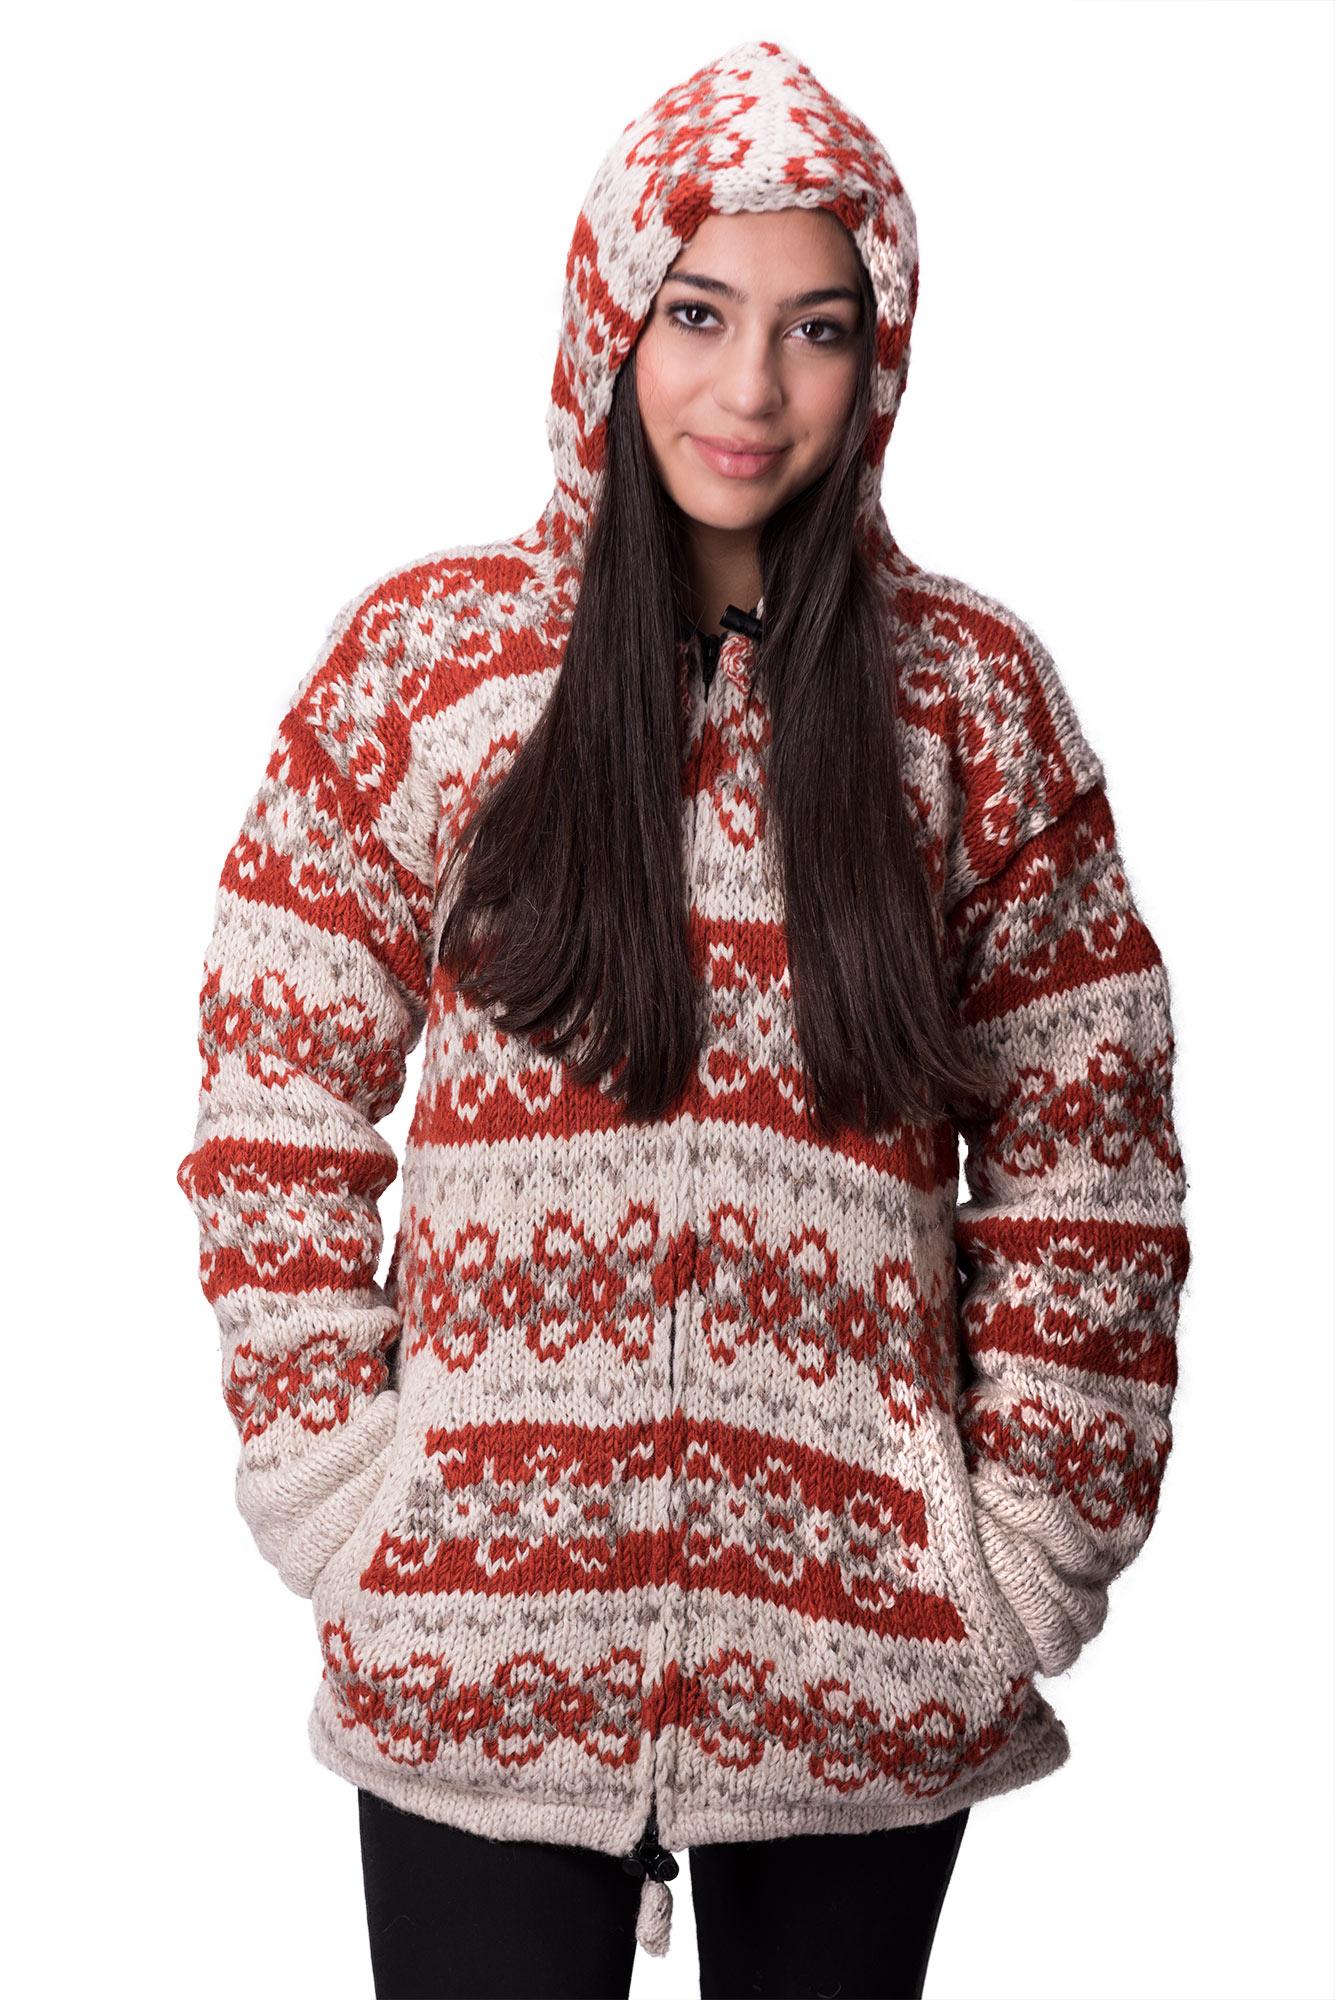 Wool Vintage Himalayan Mountain Jacket – Long Length Cinnamon & Cream